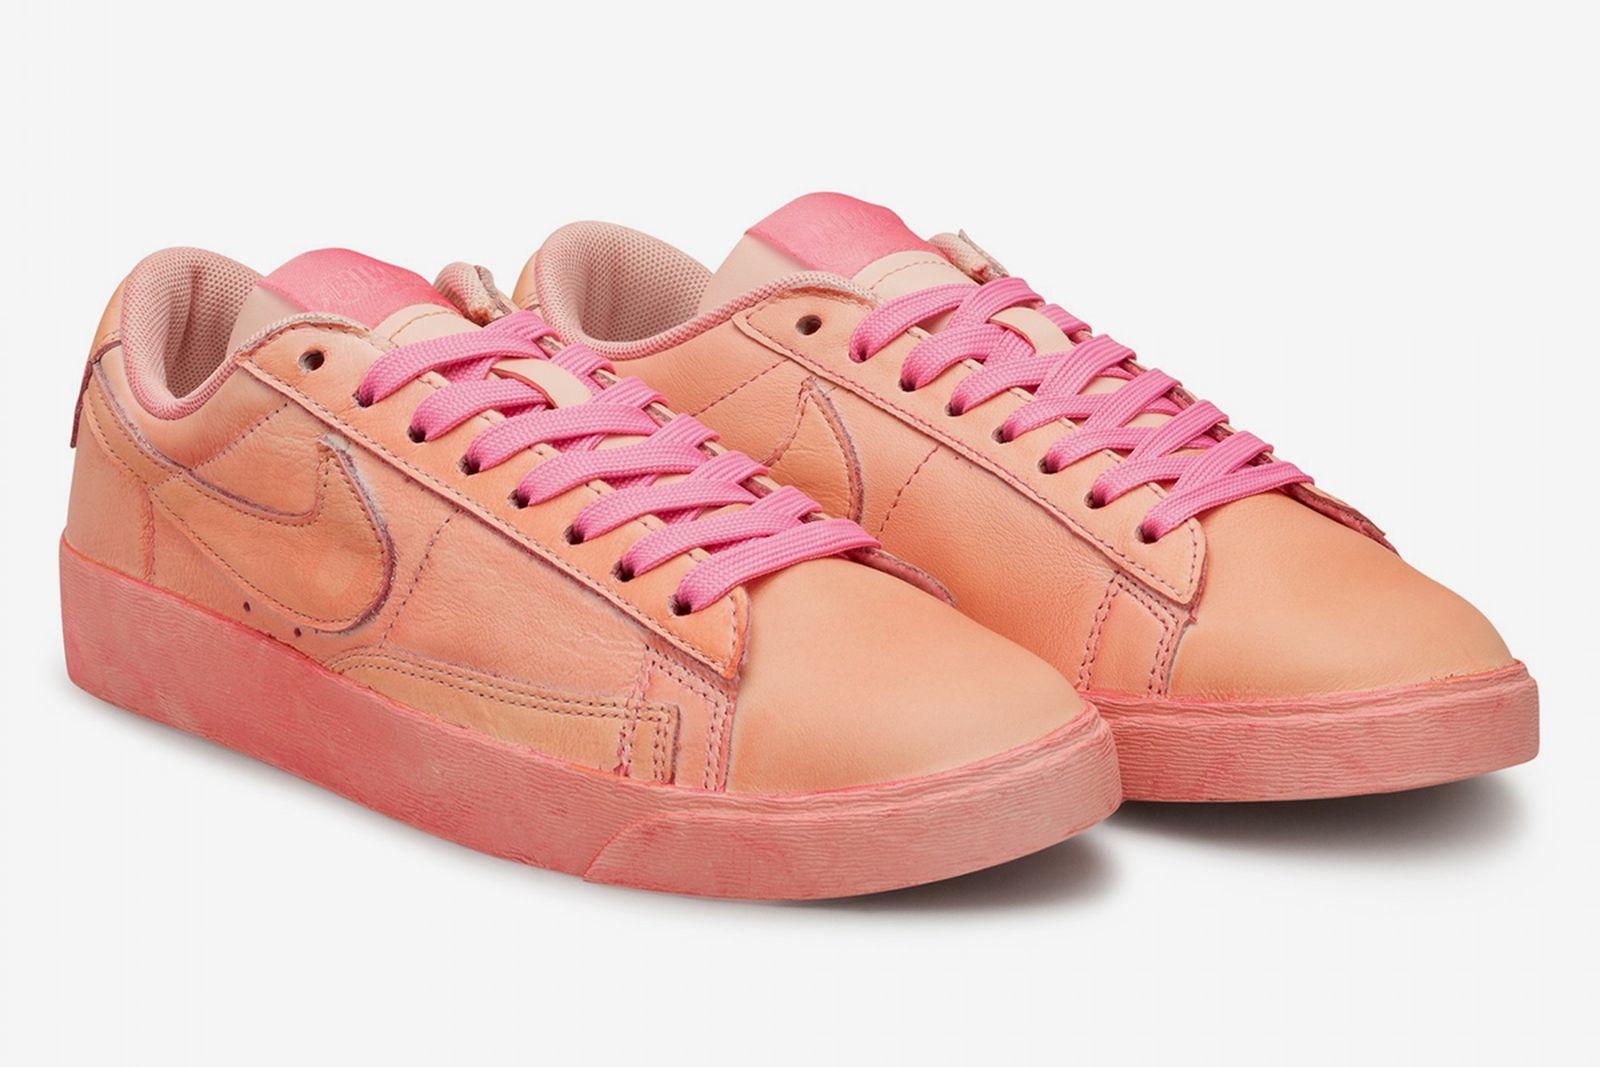 COMME des GARÇONS x Nike Blazer Low Pink